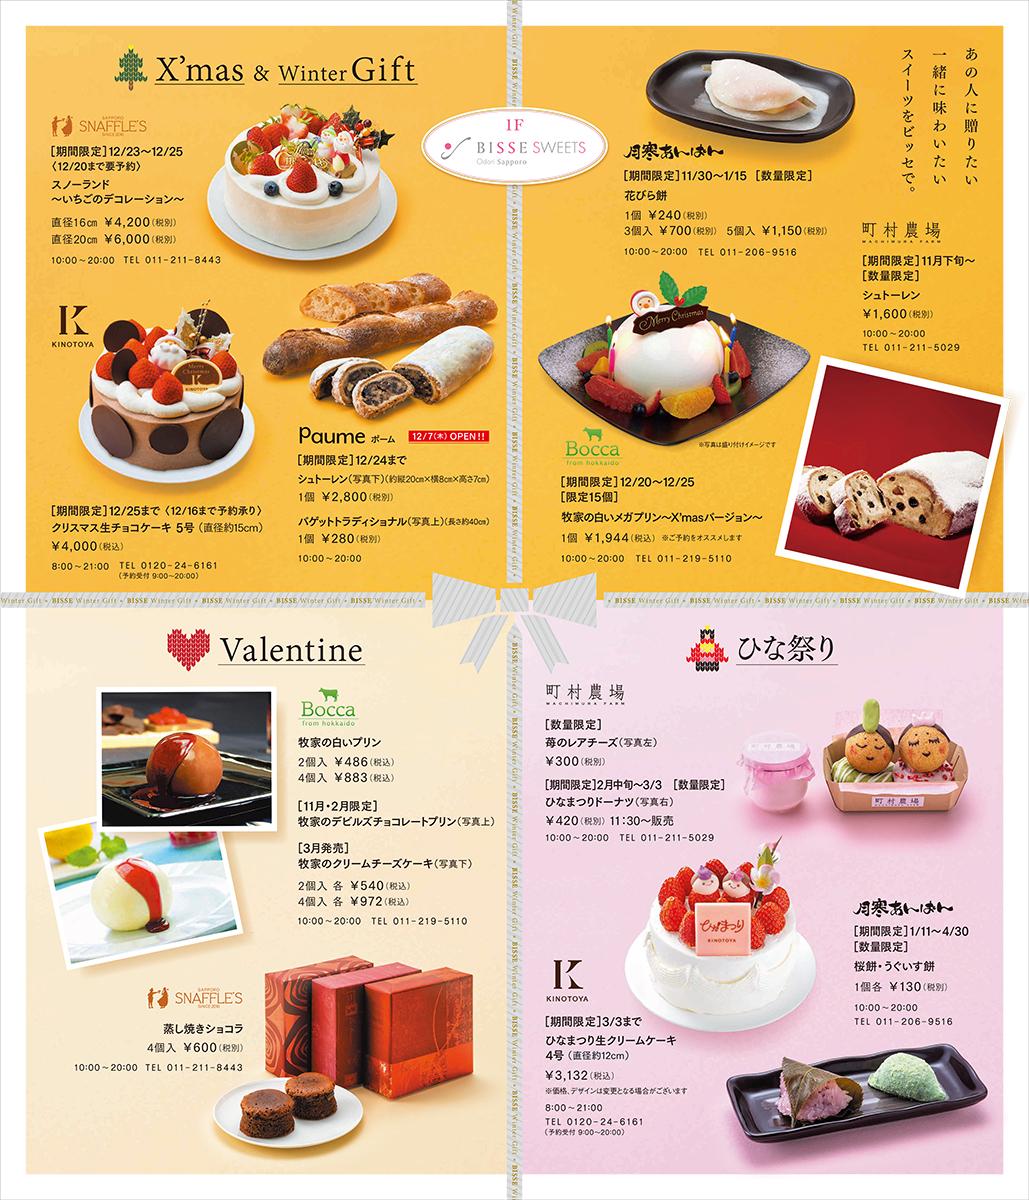 http://www.odori-bisse.com/info/up_images/news_1701114_img1-1.jpg